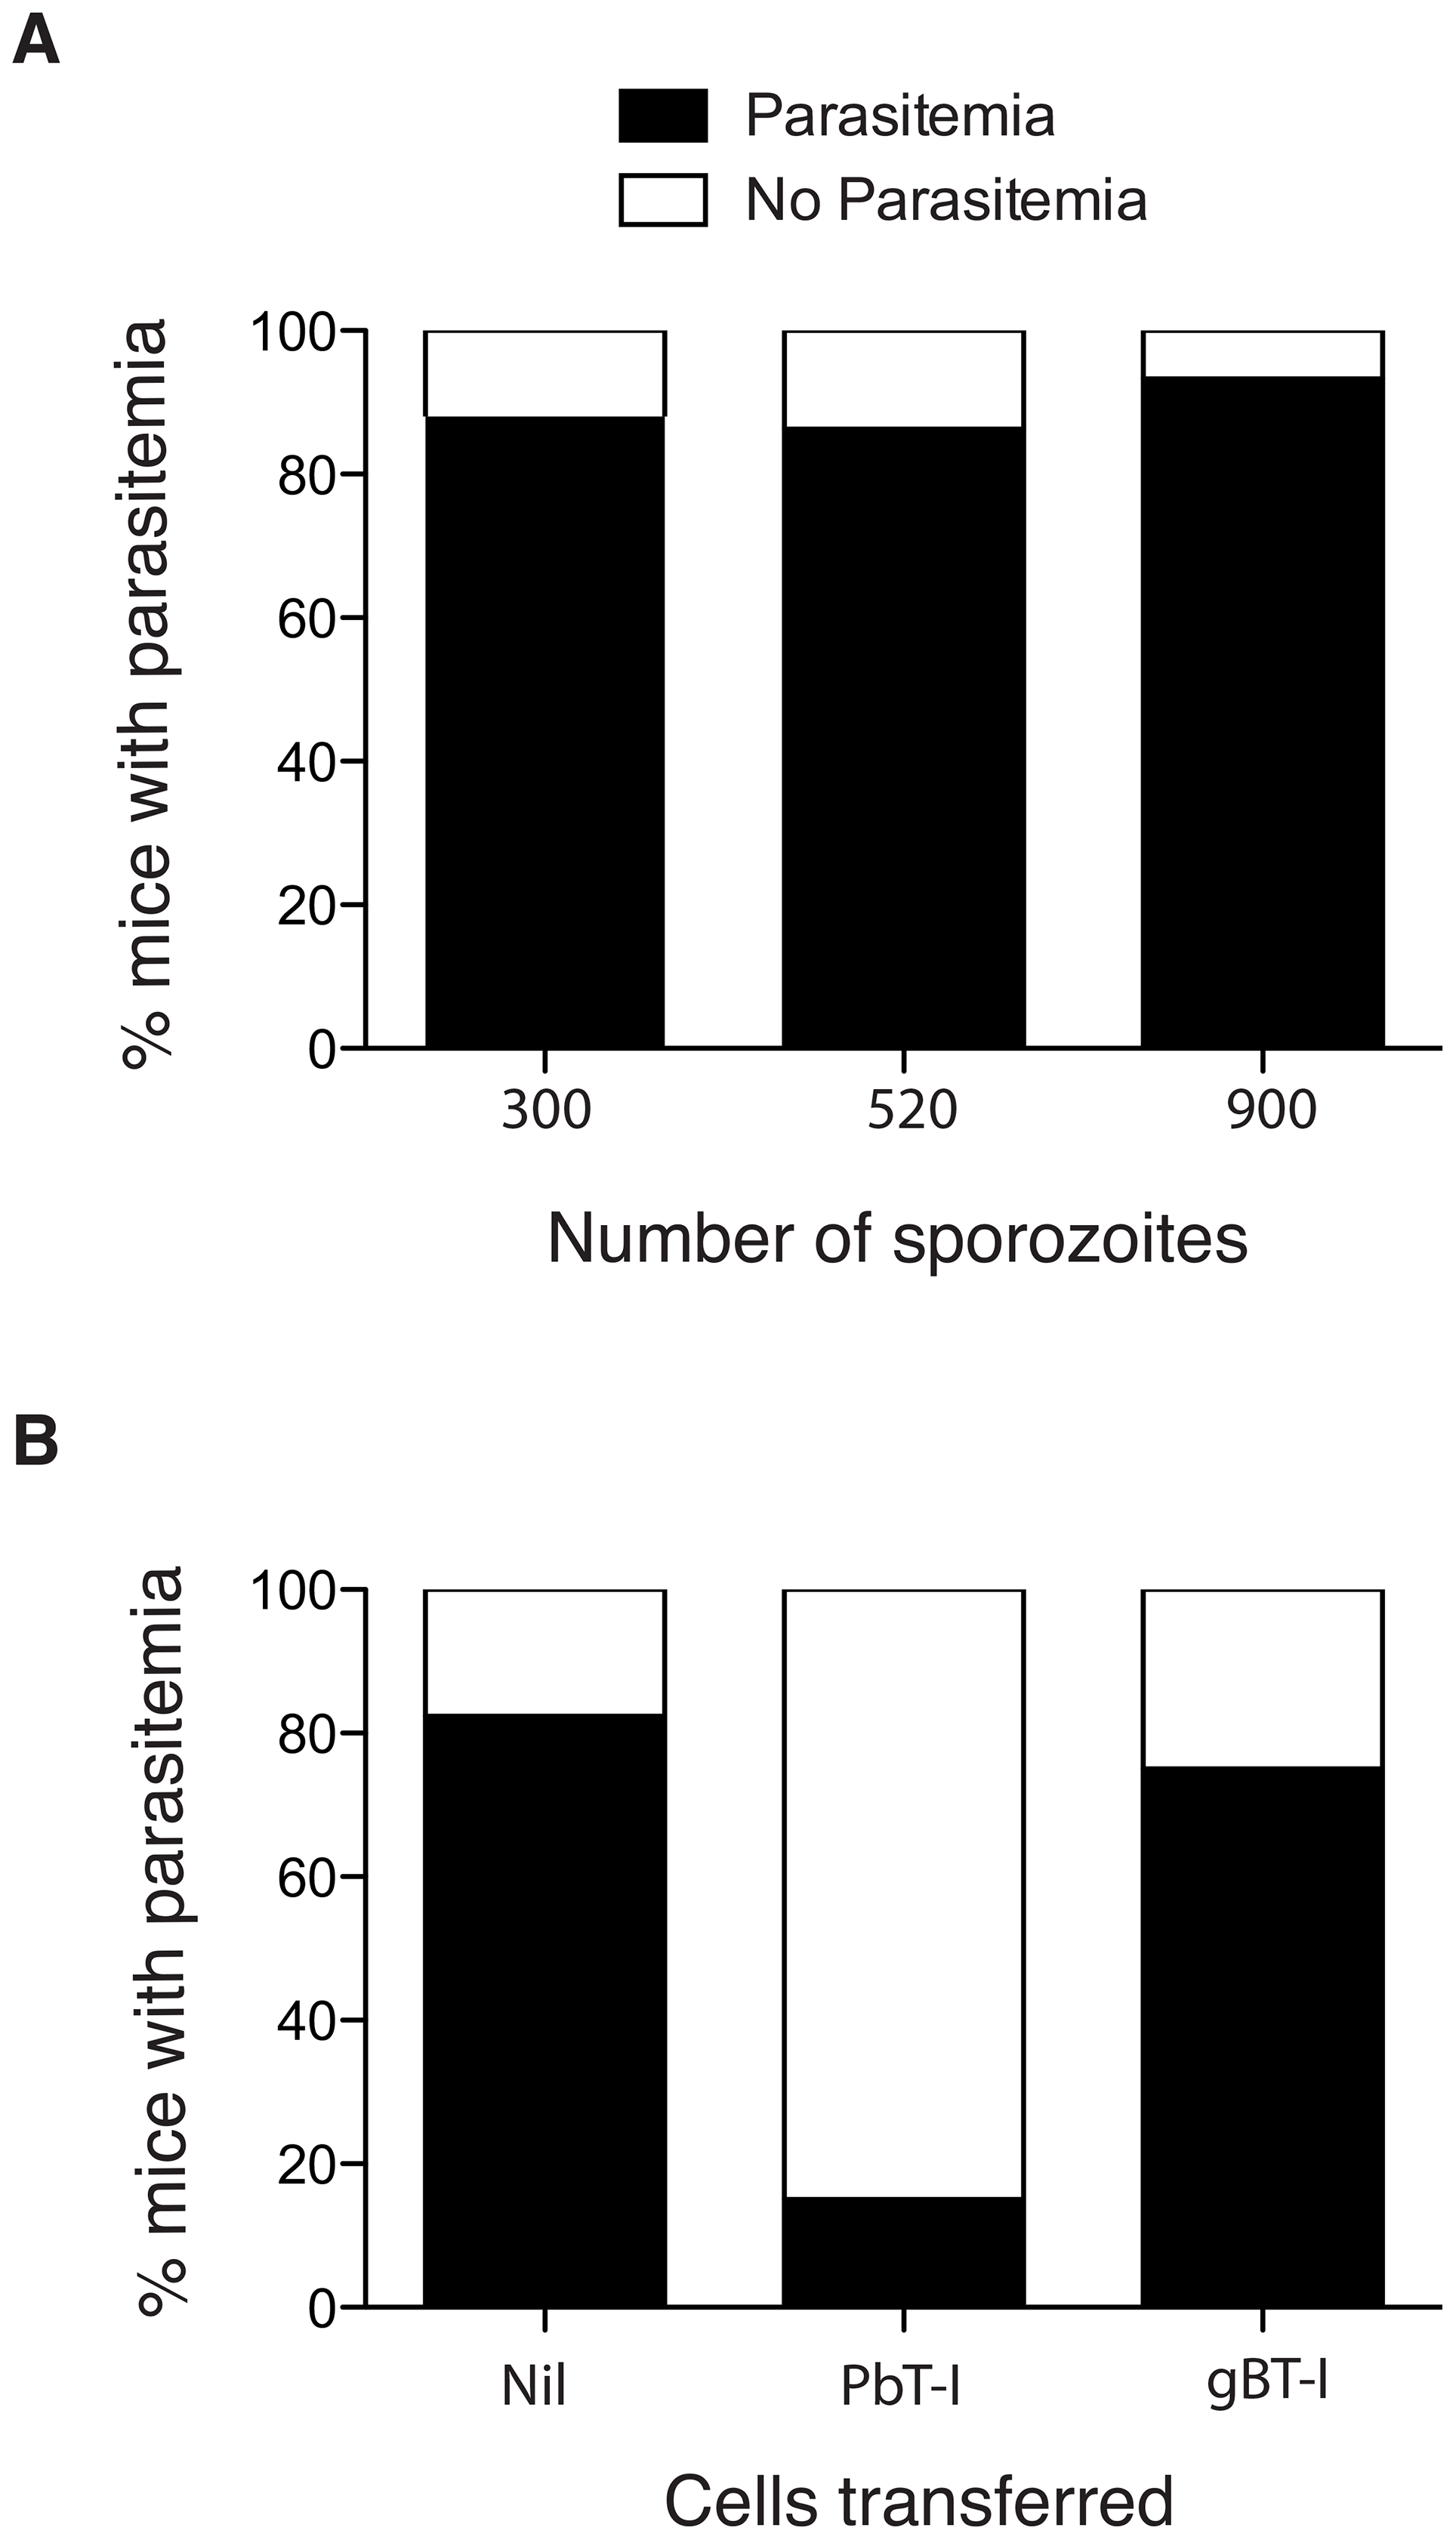 Activated PbT-I cells confer protection against a sporozoite challenge.